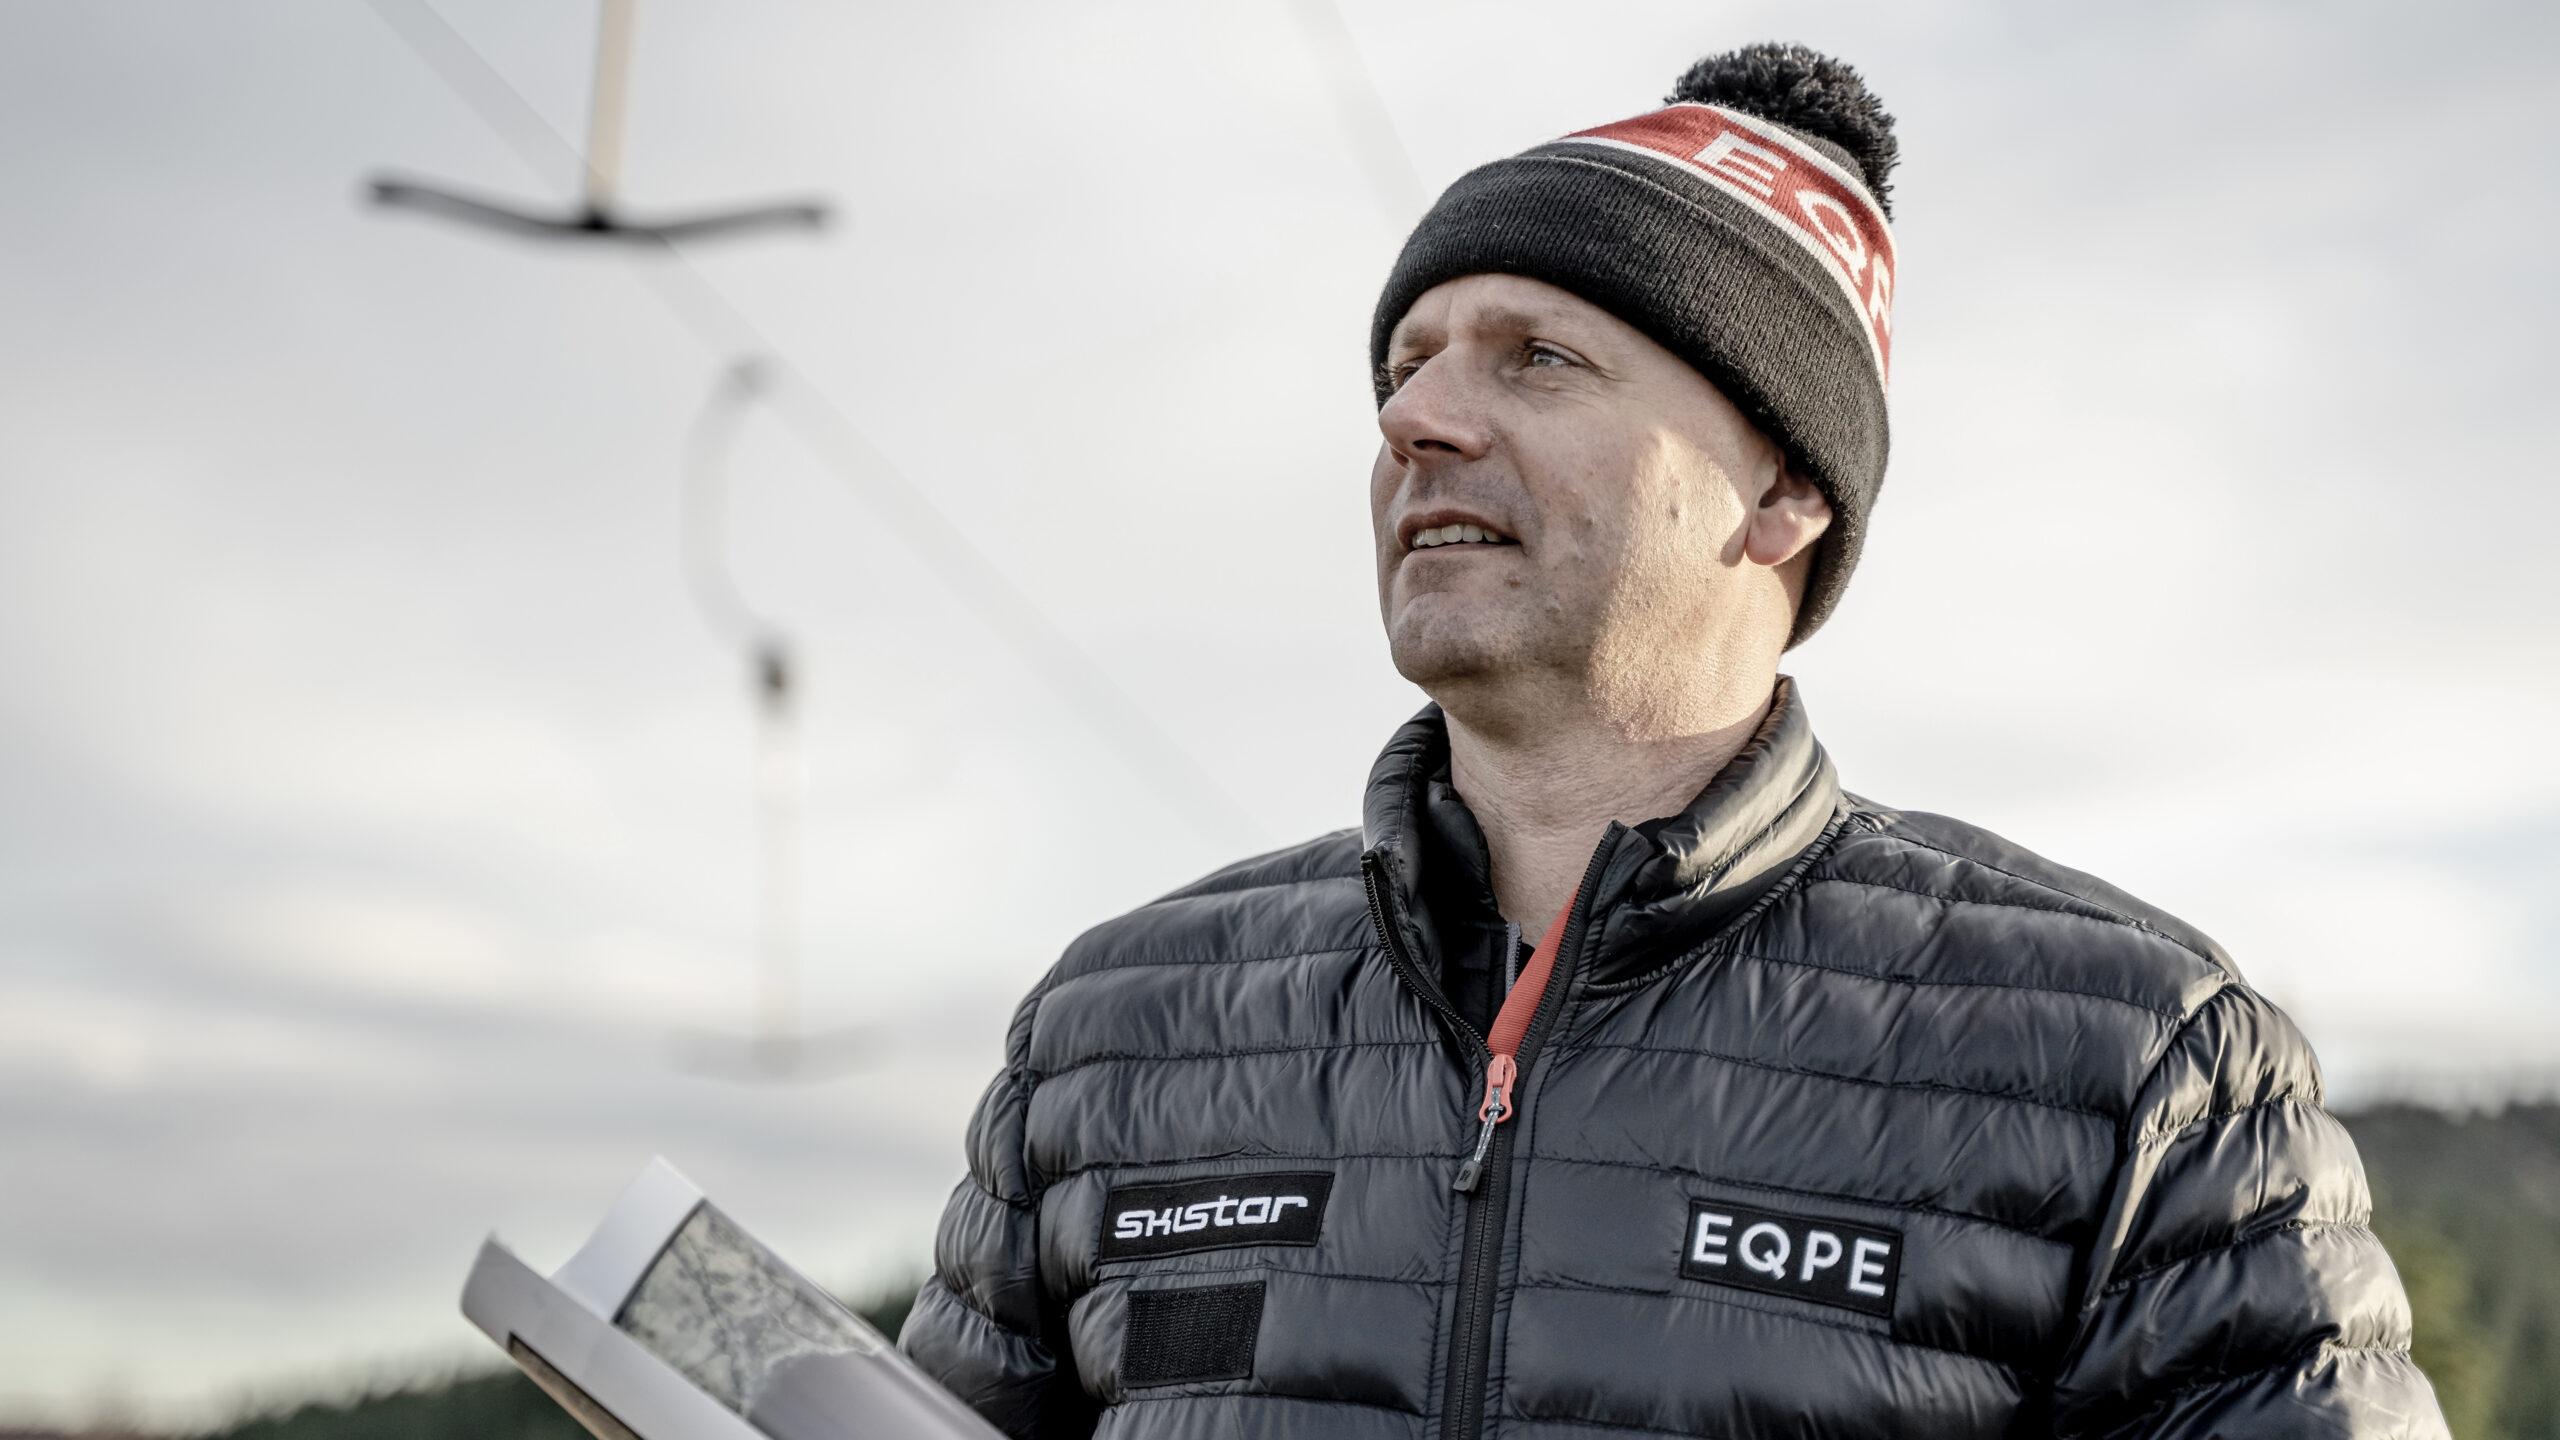 Sebastian SkiStar Åre. Mats Lind